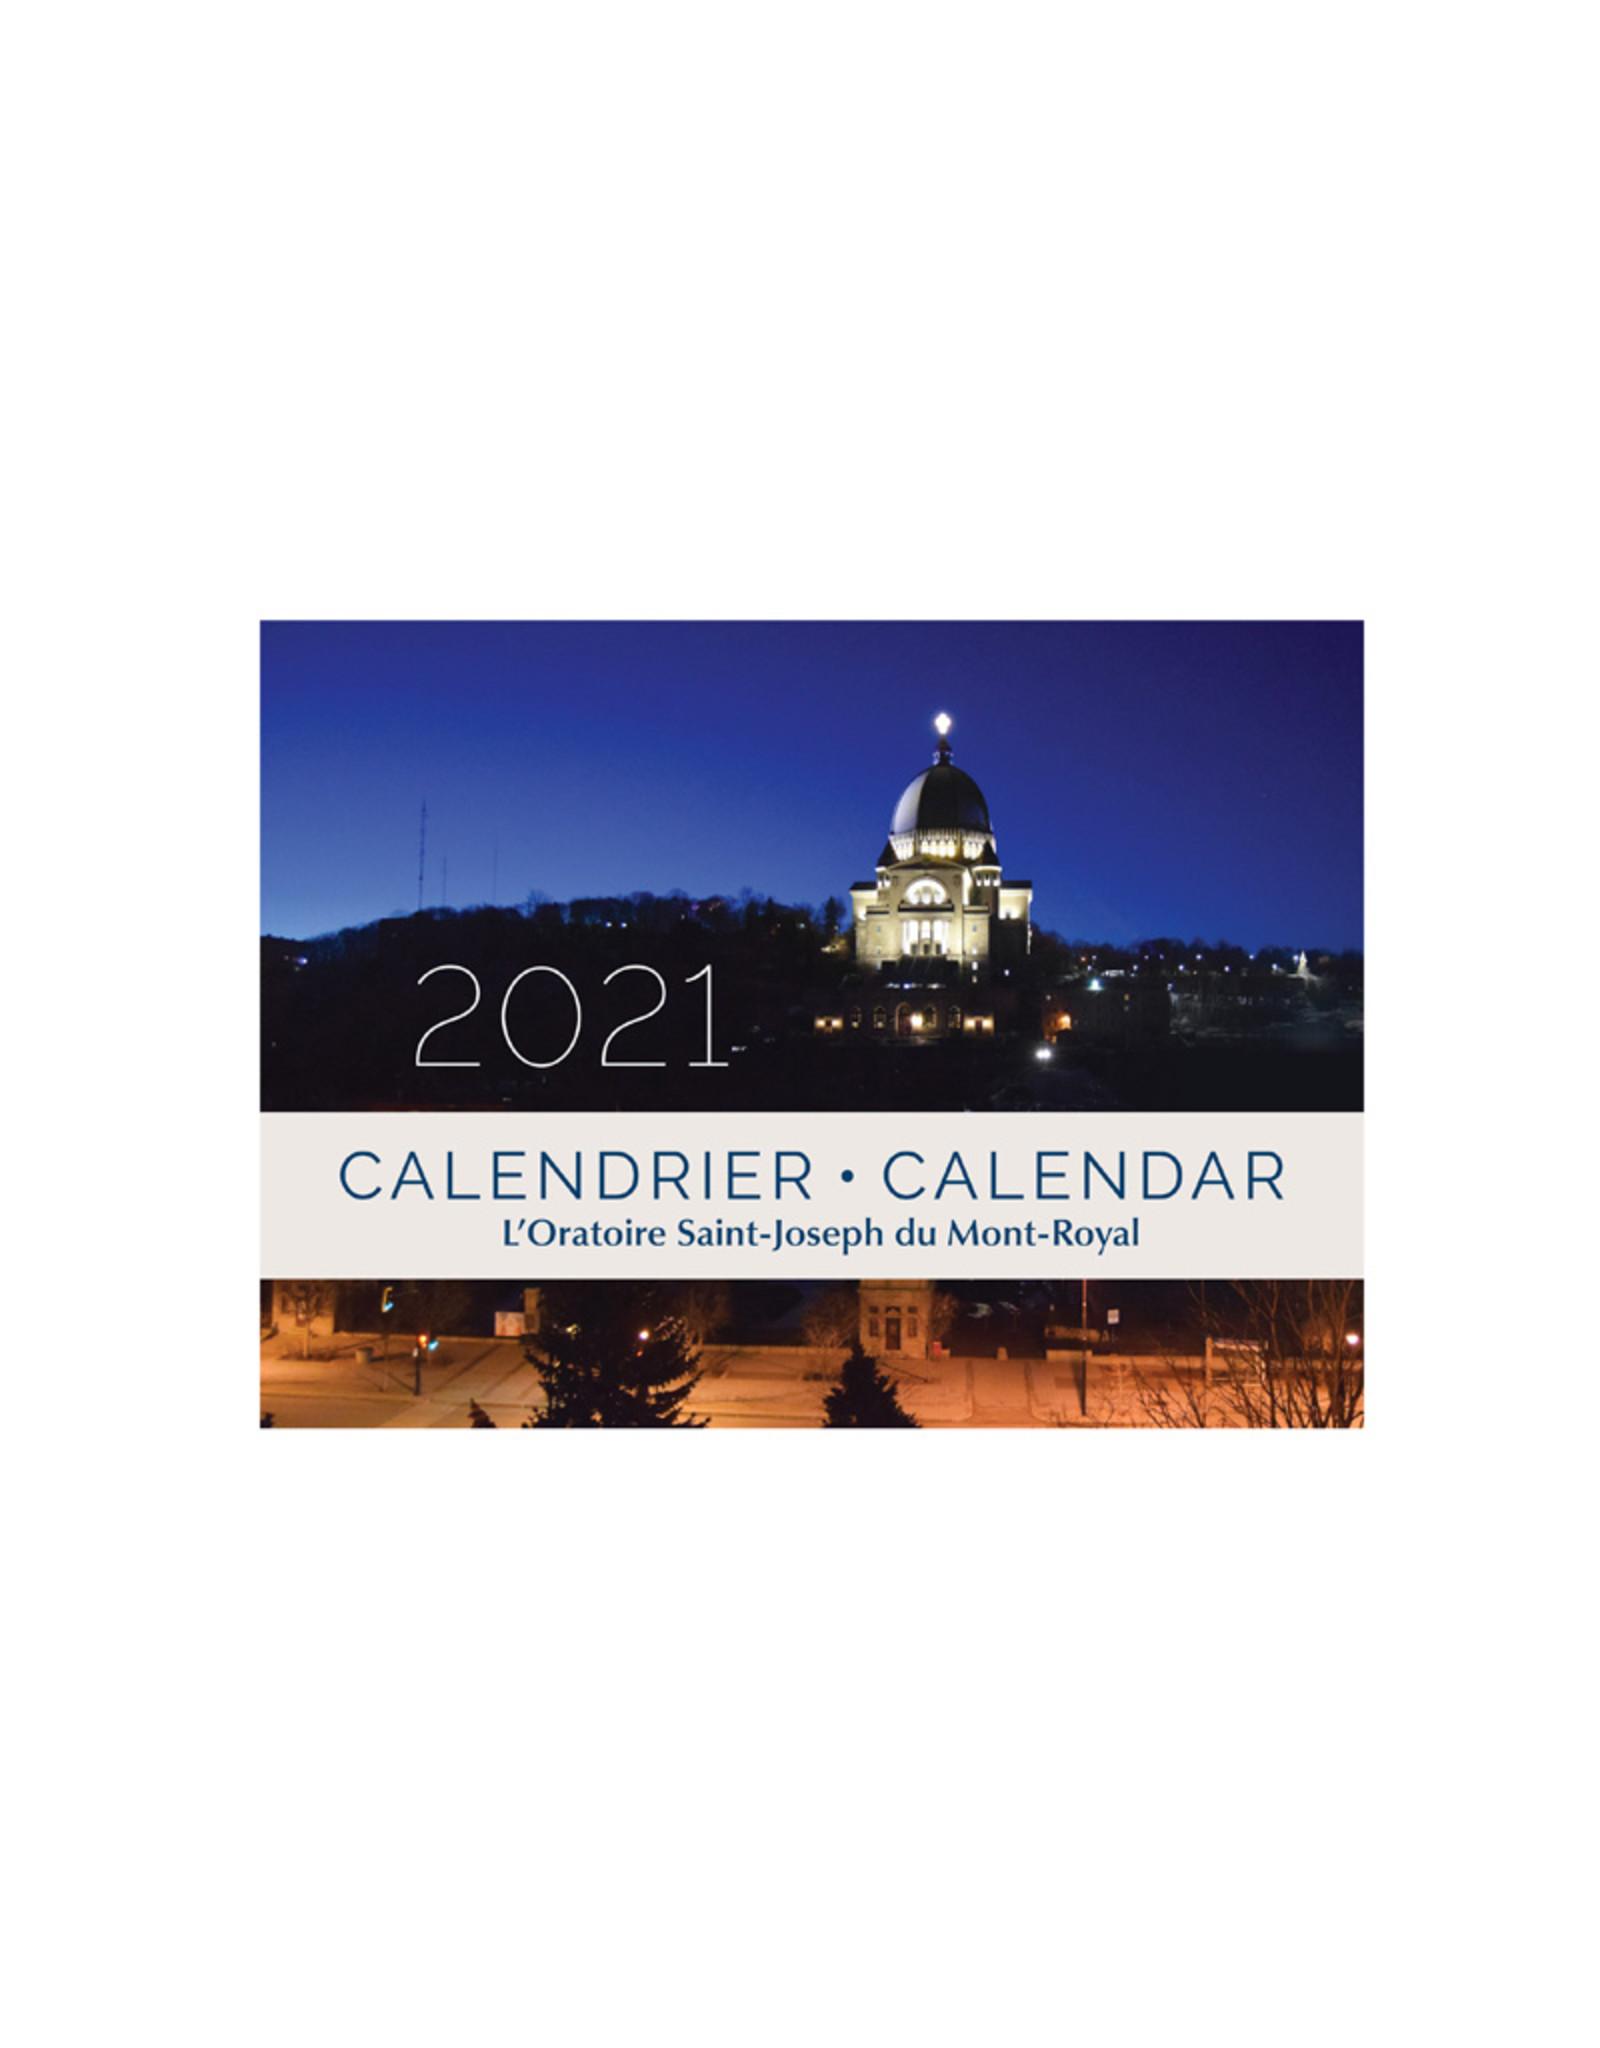 Calendrier 2021 de l'Oratoire   L'Oratoire Saint Joseph